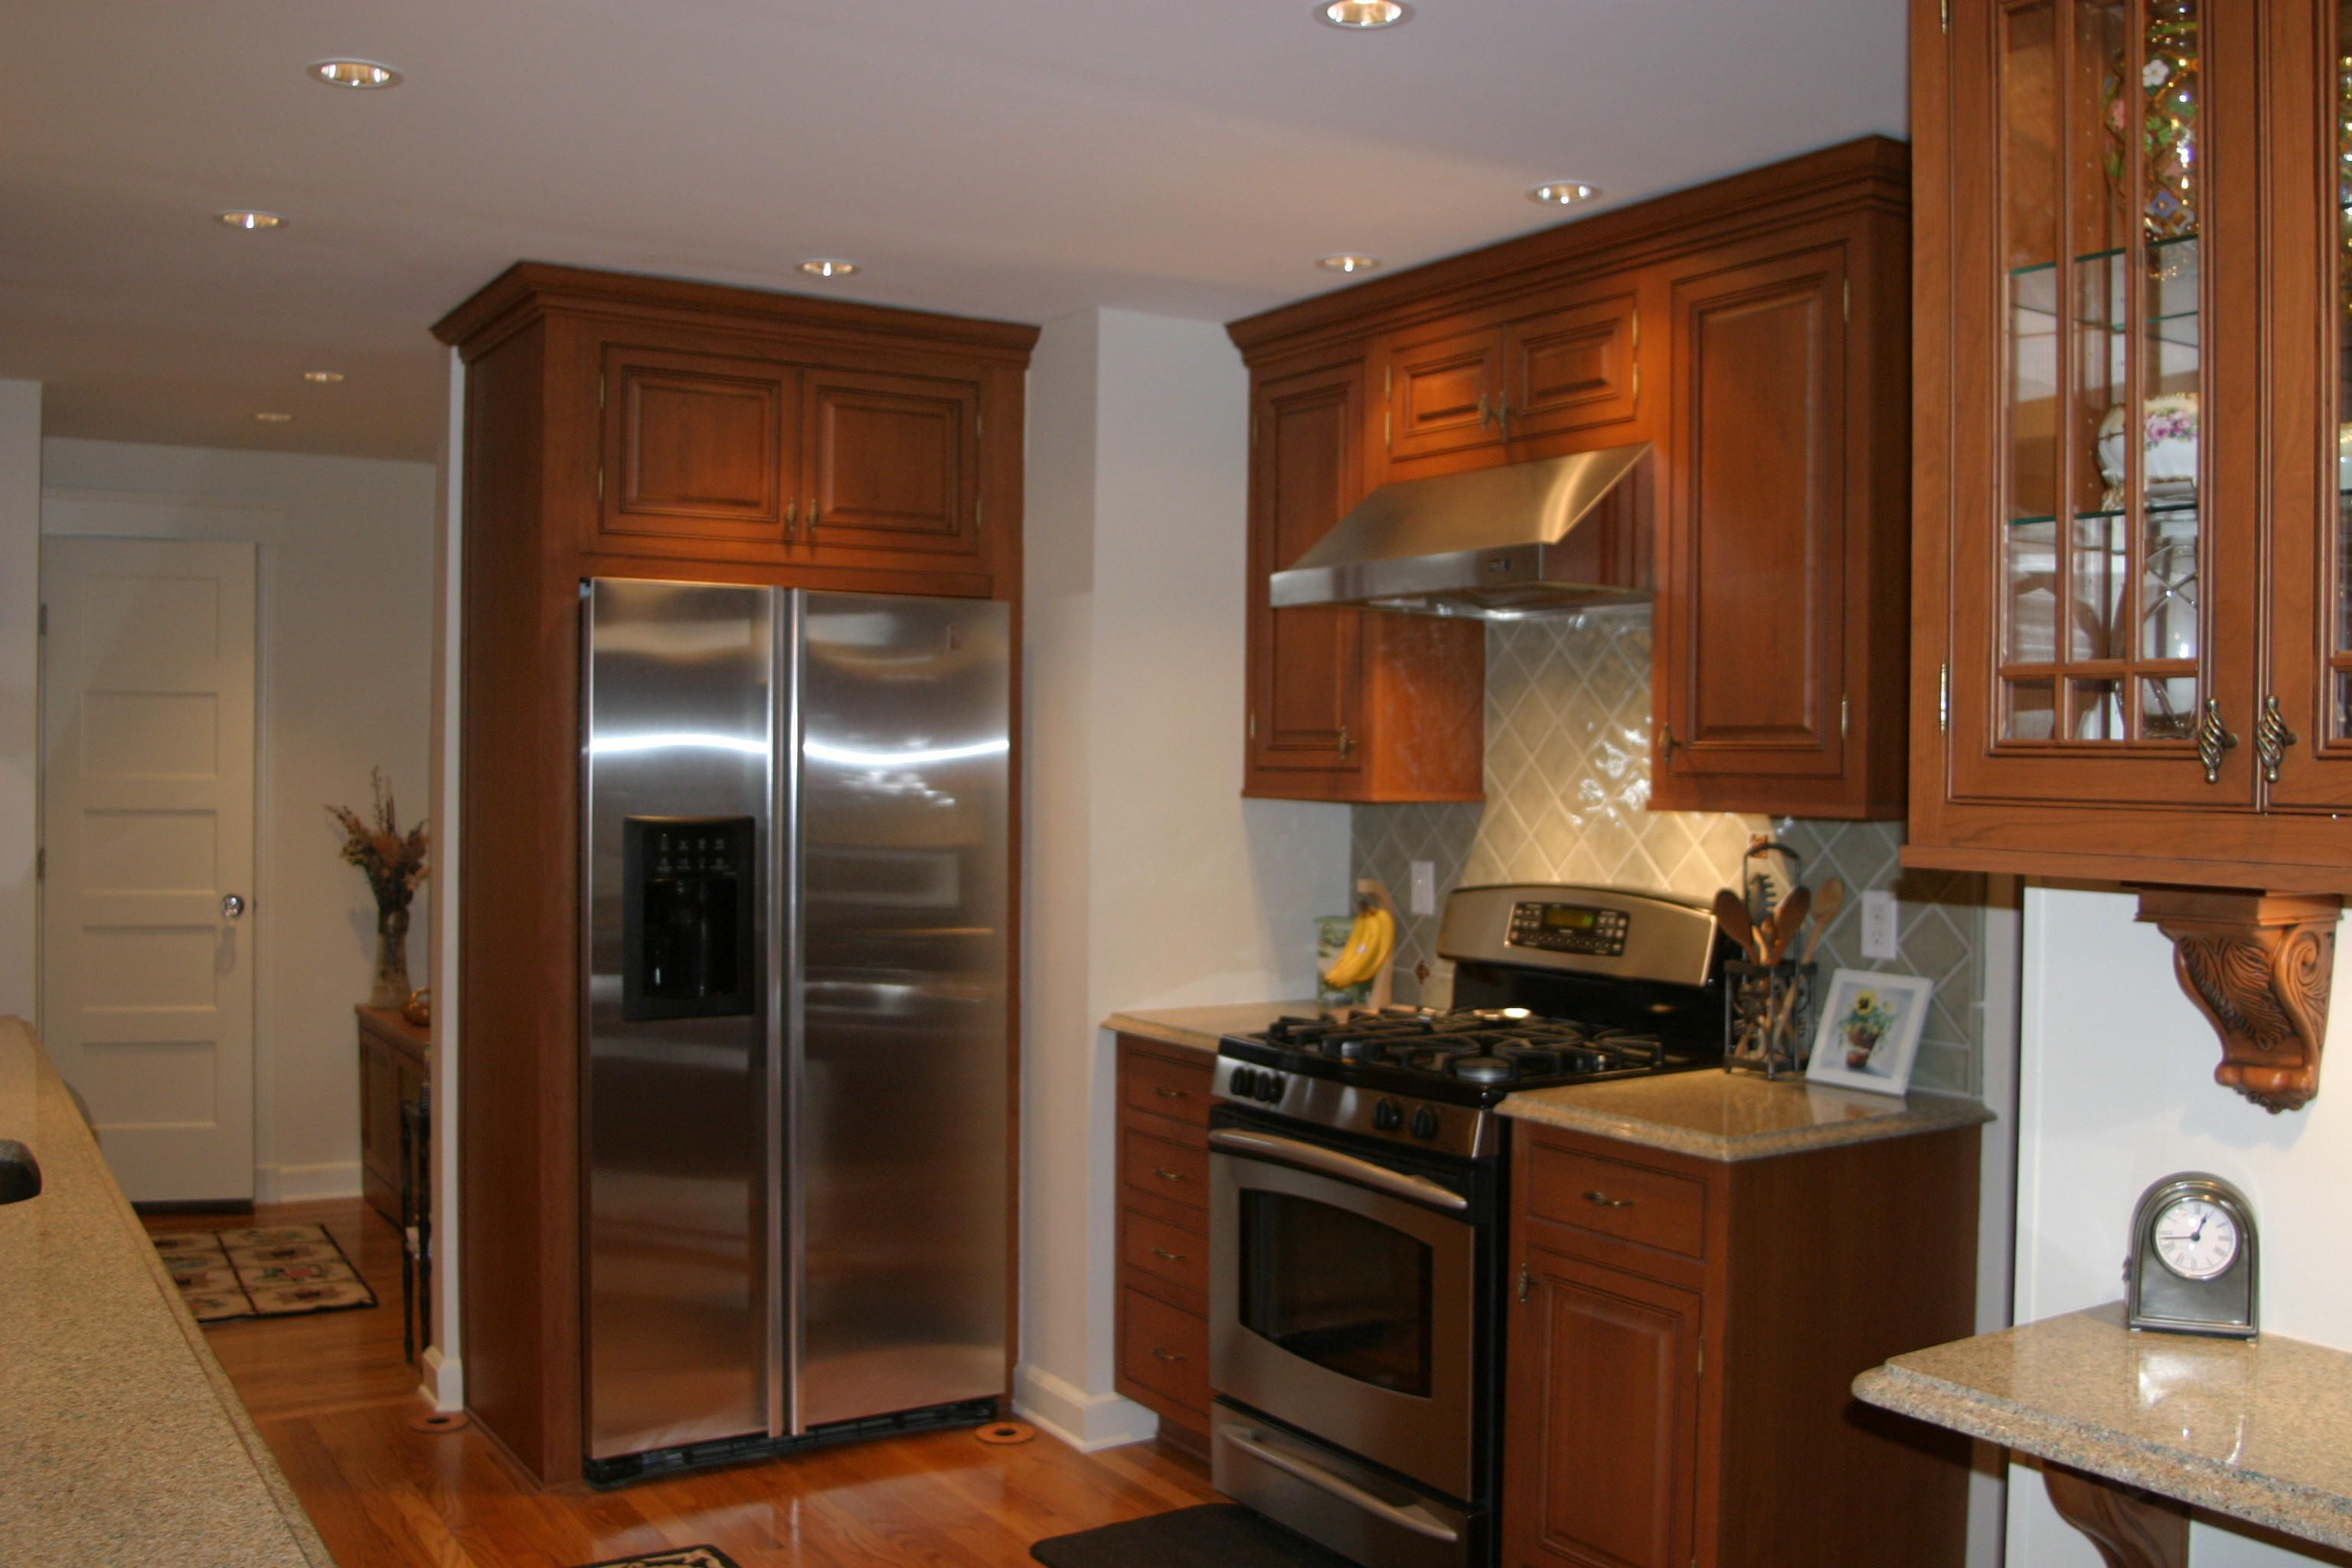 kitchen cabinet refacing Stamford CT & Cabinet Refacing Portfolio | Dreamwork Kitchens | Westchester NY ...